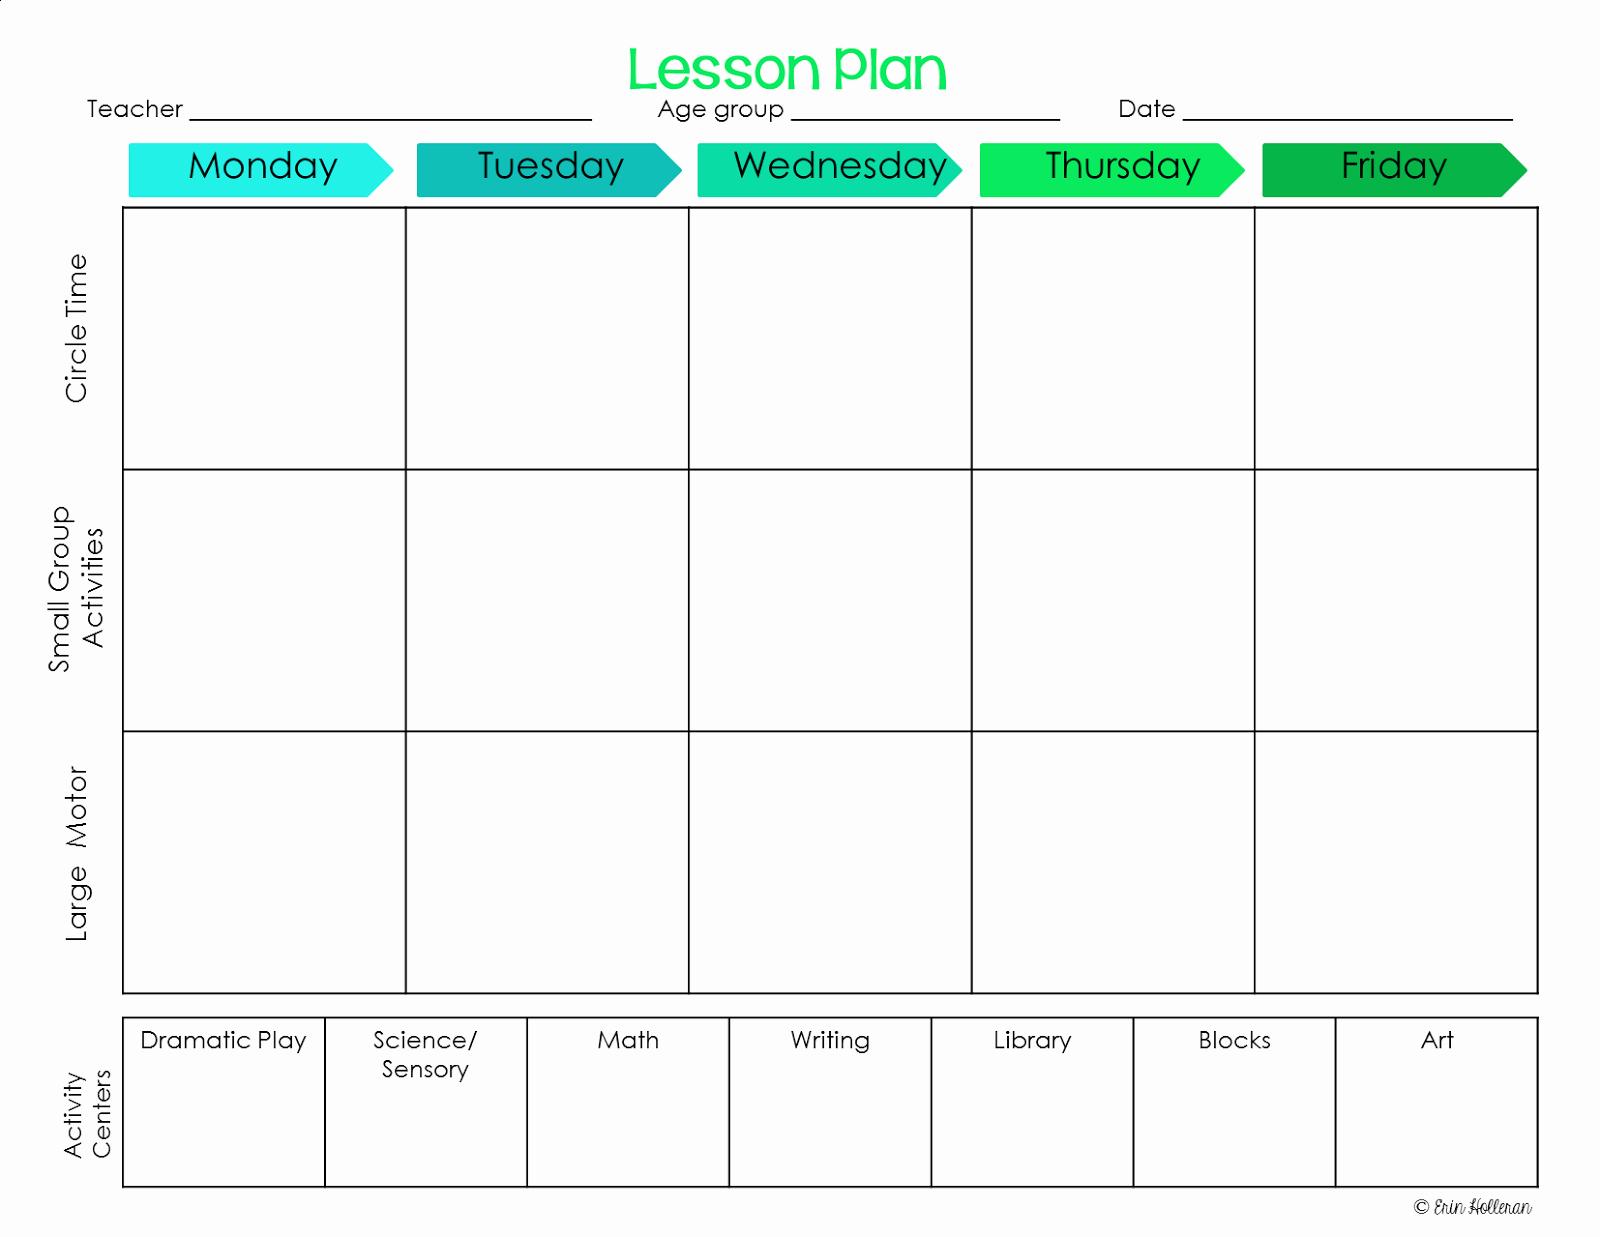 Kindergarten Lesson Plan Template Unique Preschool Ponderings Make Your Lesson Plans Work for You